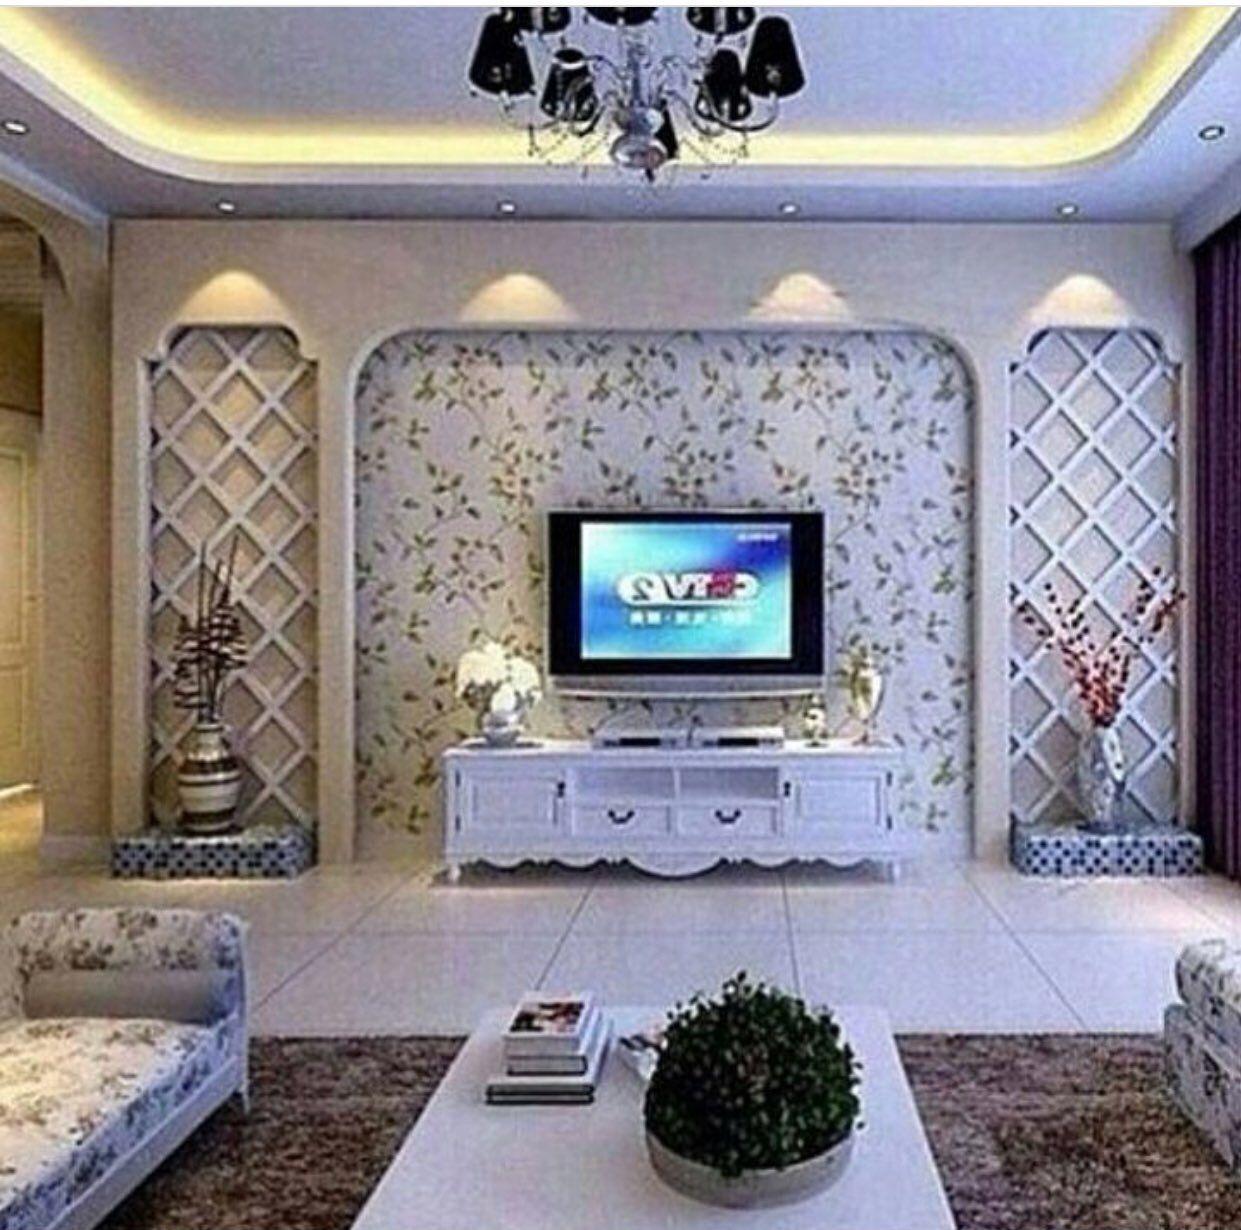 اصباغ وديكورات عباد الرحمن ساده ايطالي ورق حائط ارضيات بركيه ديكورات للتواصل Wallpaper Living Room Paint Colors For Living Room Living Room Color Inspiration